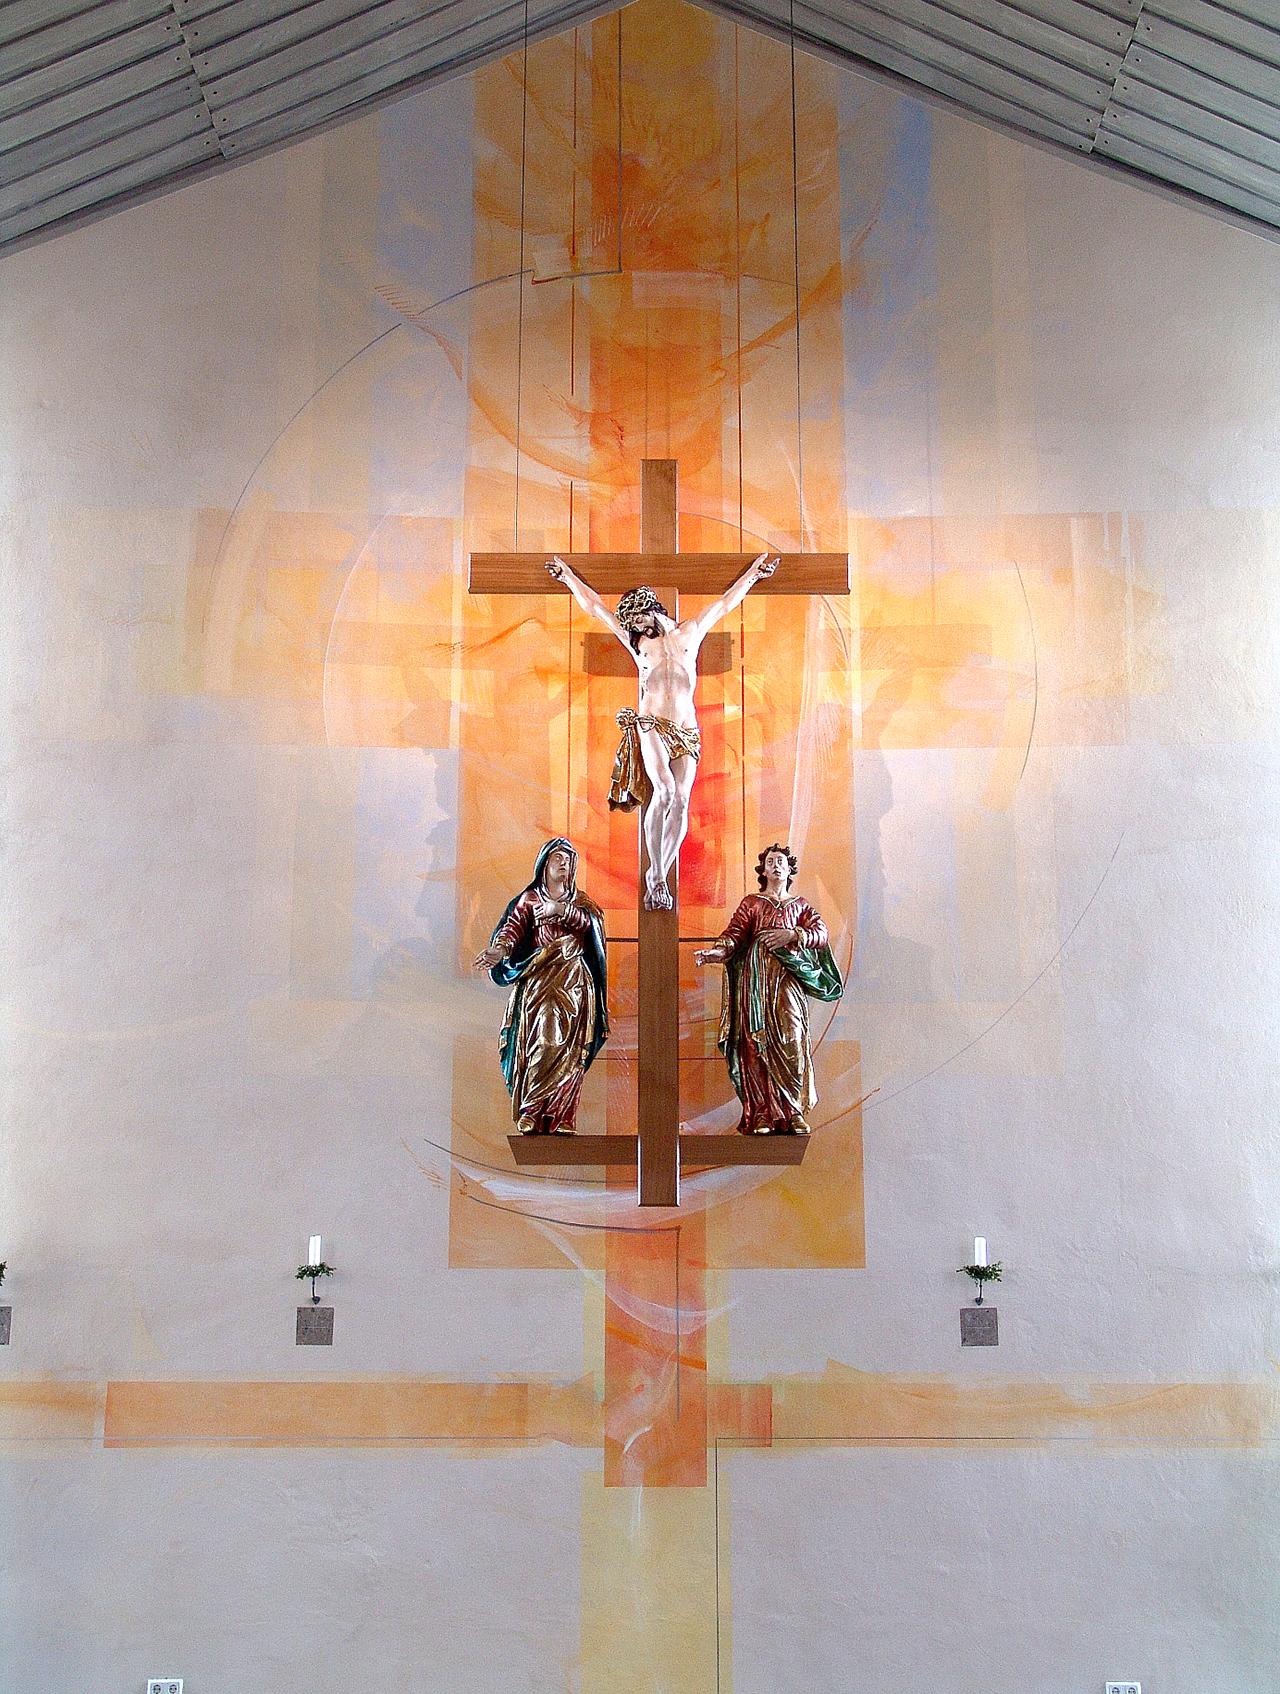 Kath. Kirche Monzelfeld, Farbgestaltung 2005